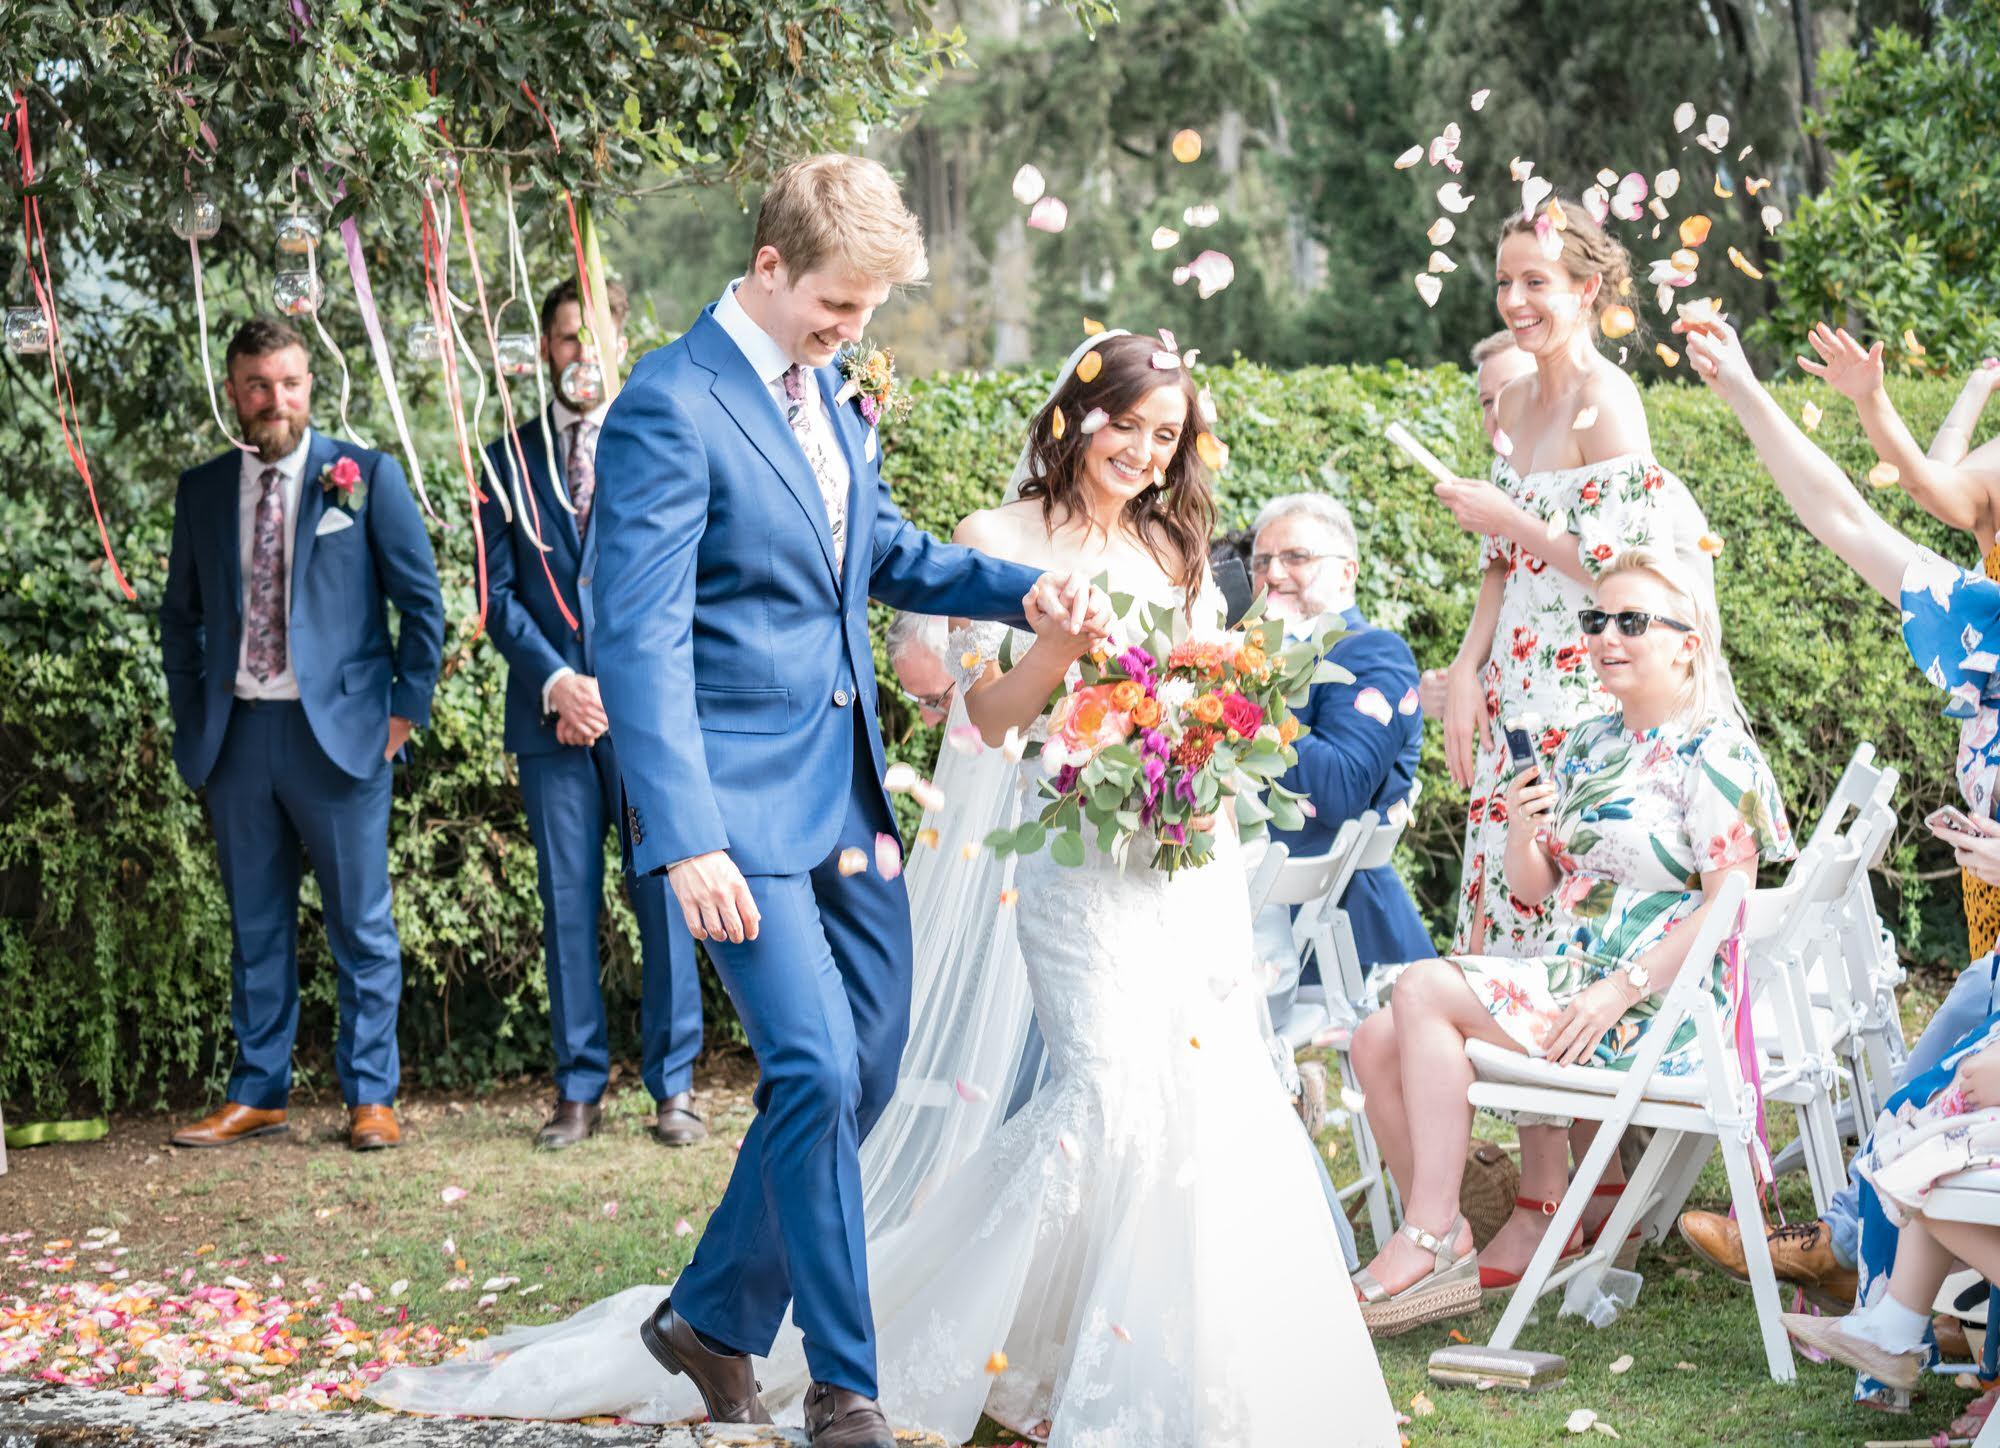 Lauren & Paul: Destination wedding in Tuscany